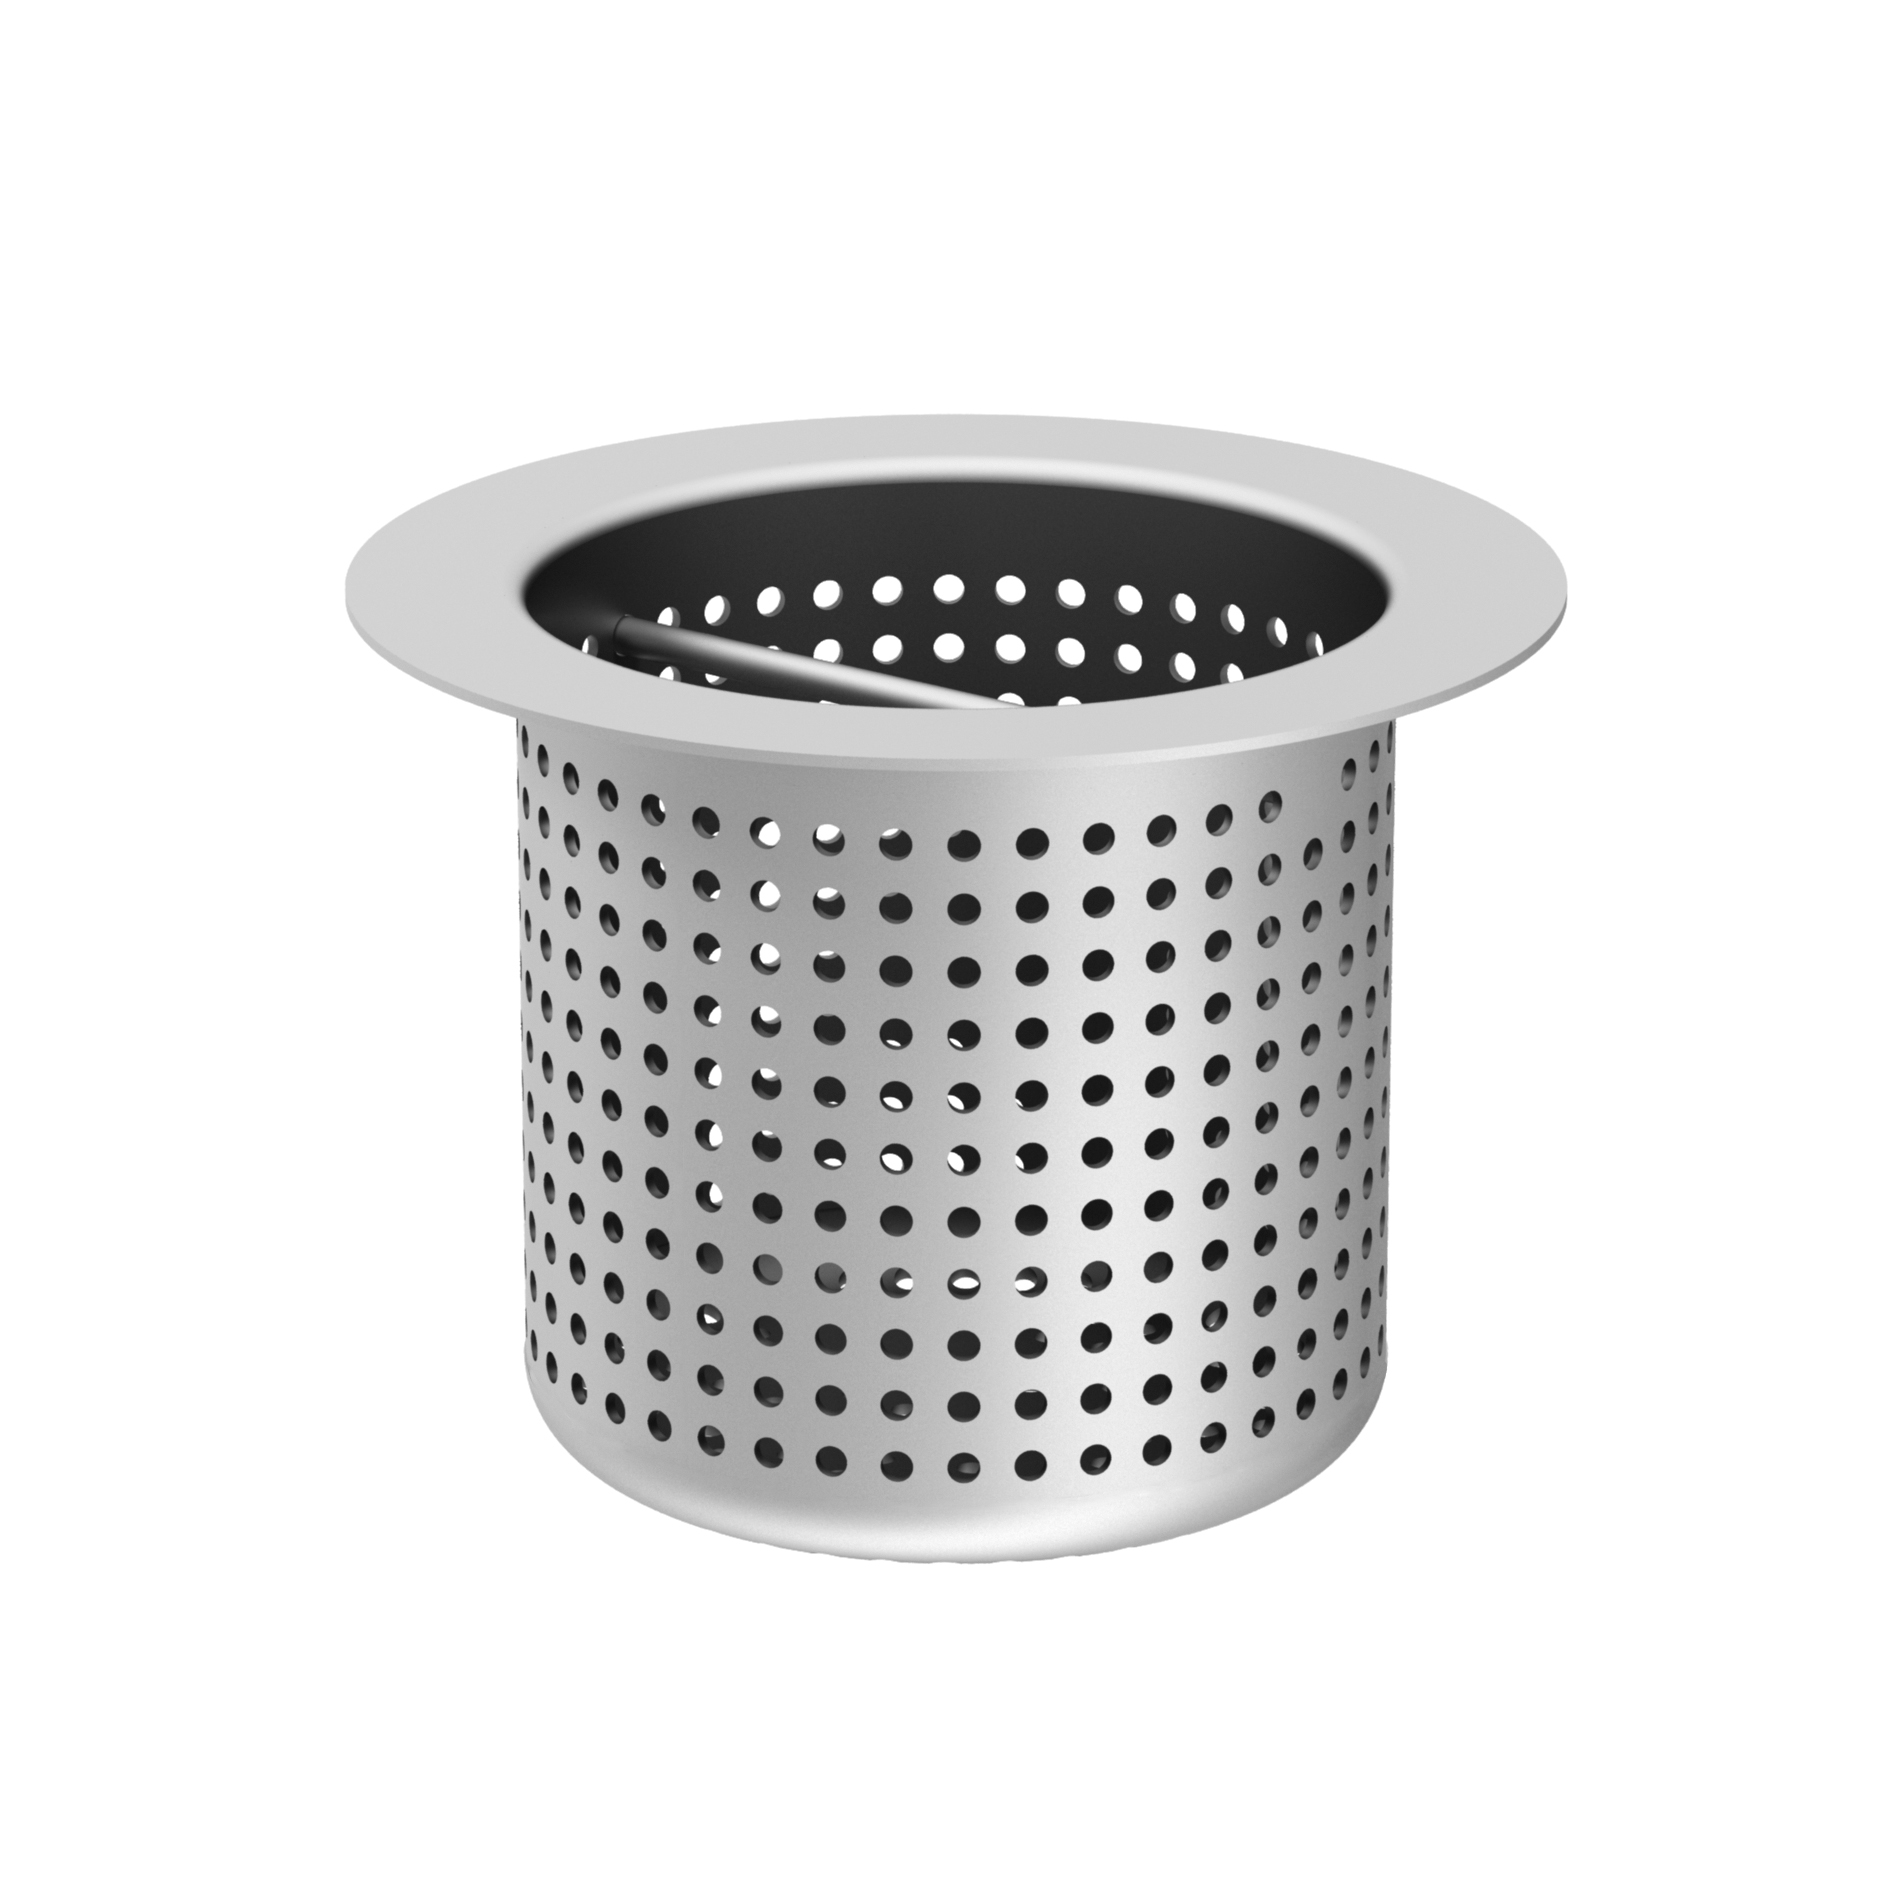 Aco floor drain accessories aco building drainage for Ground drain